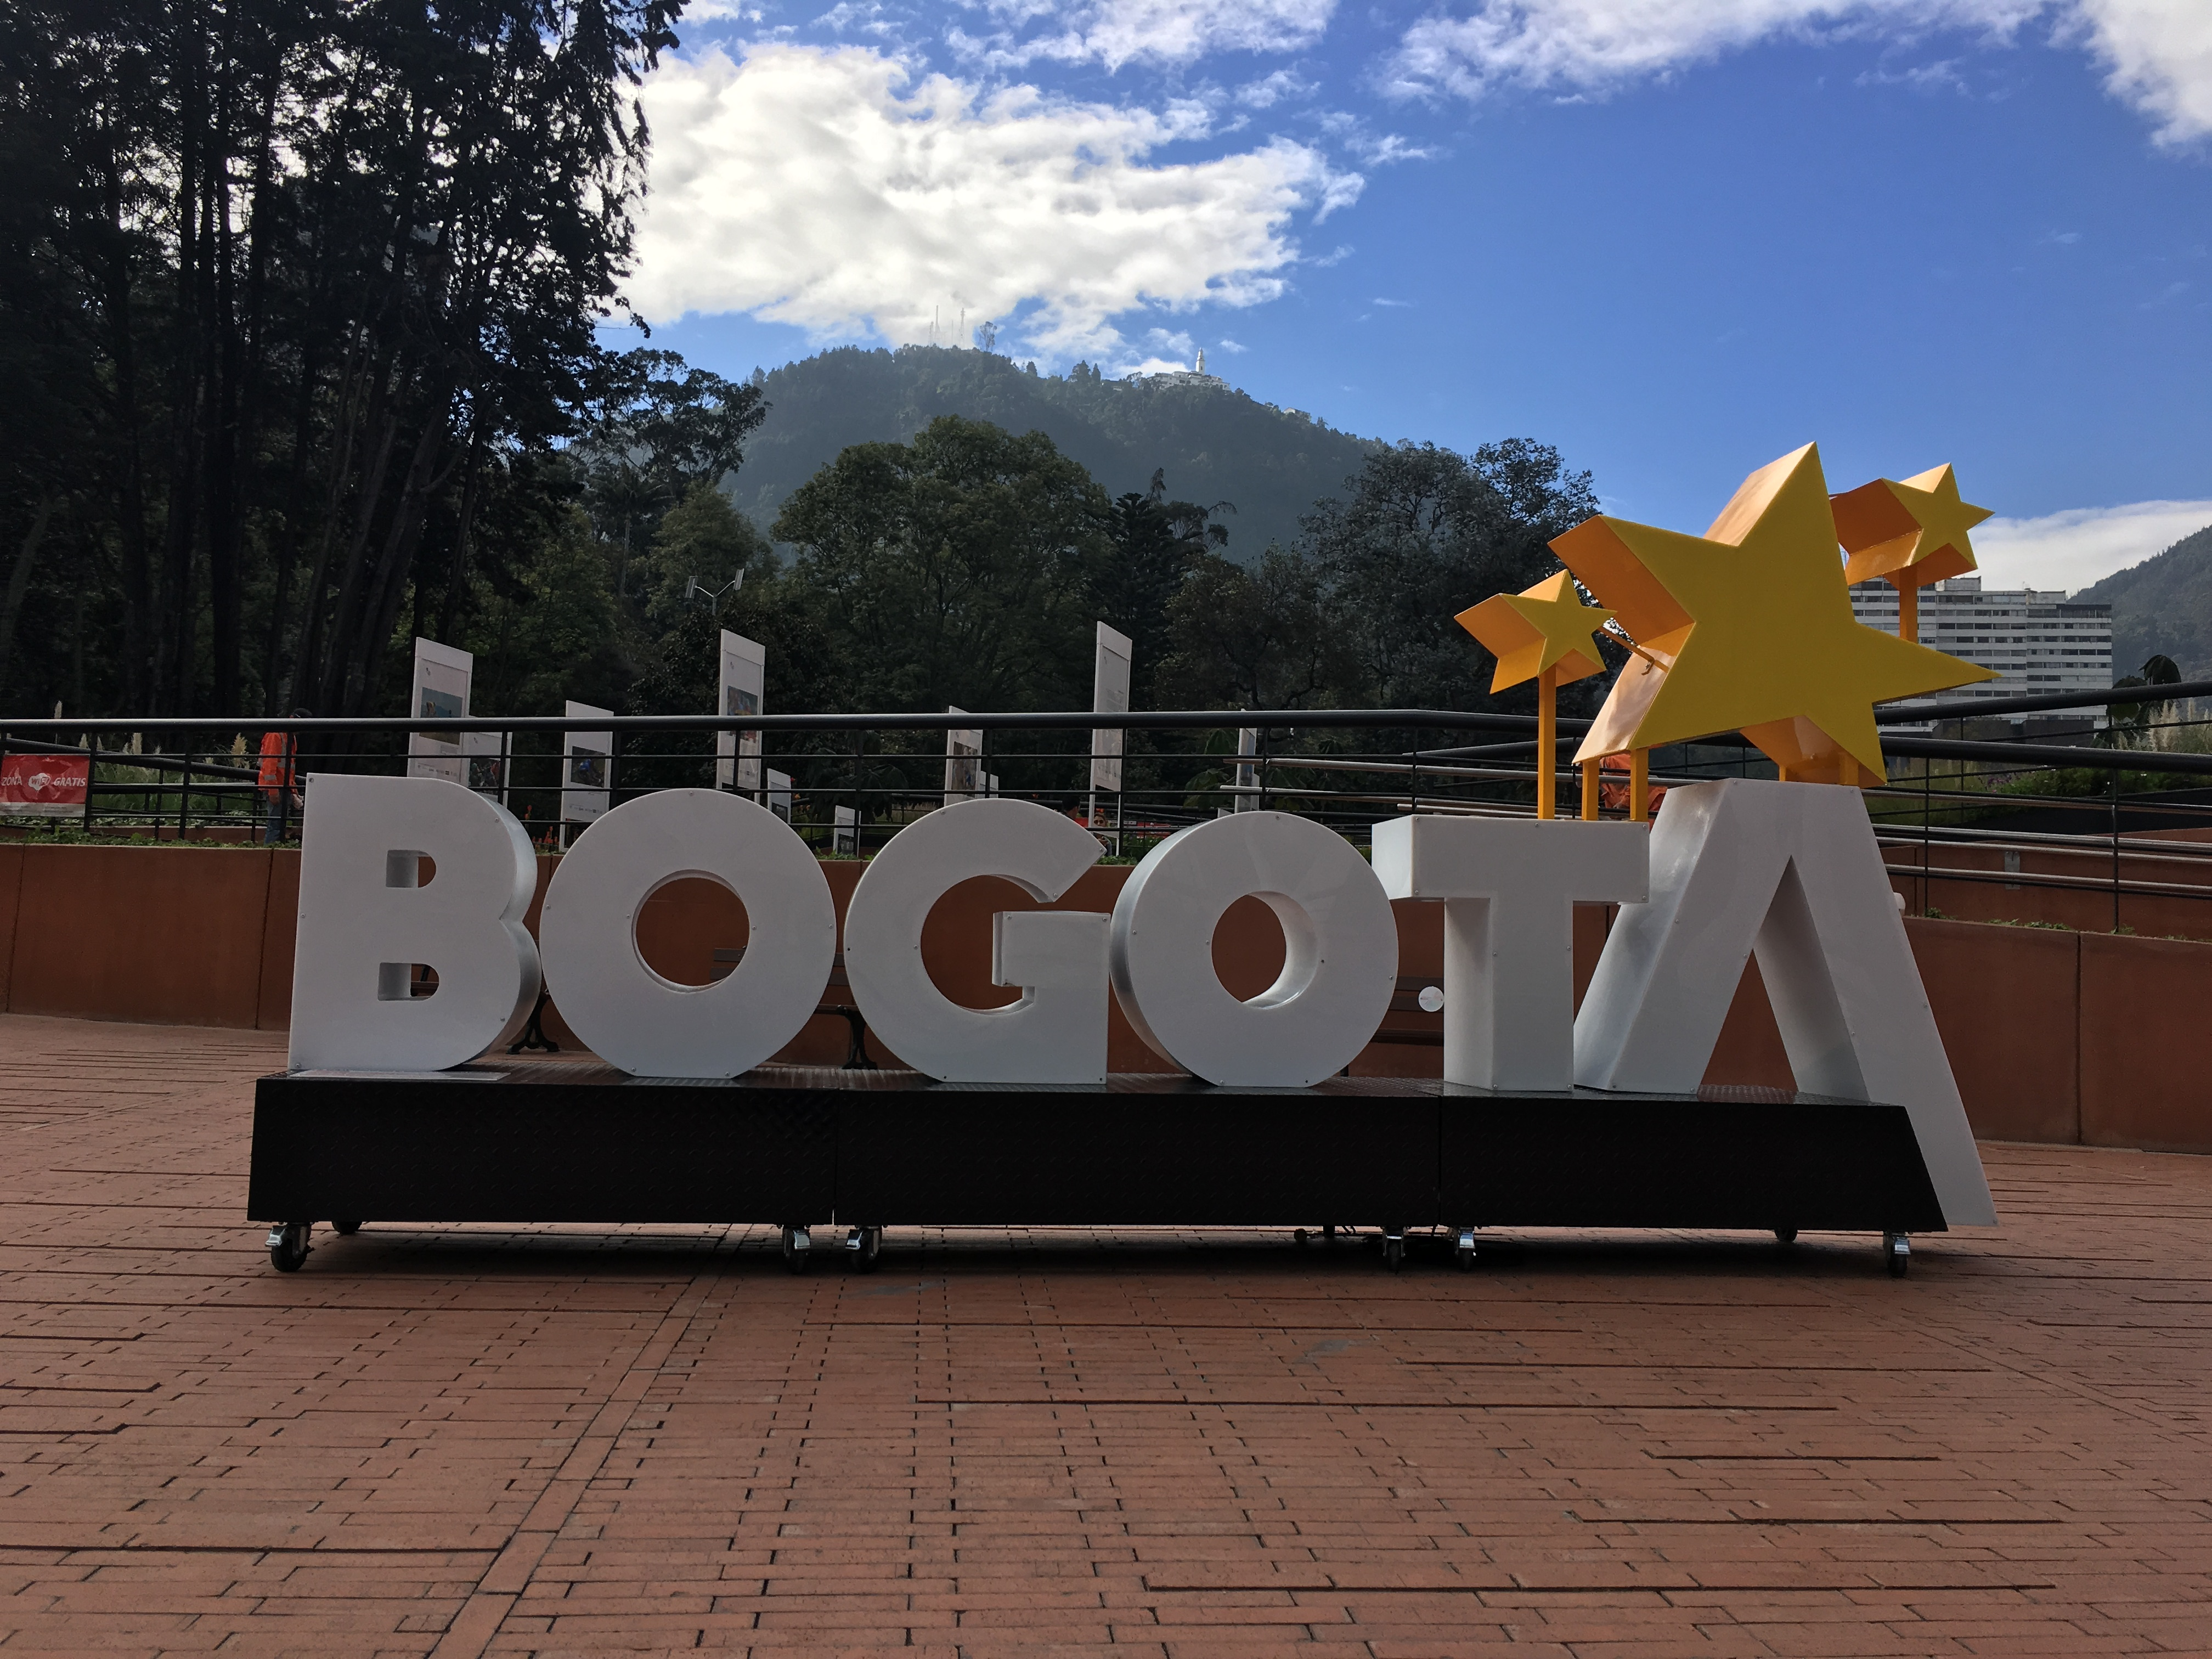 Bogota sign